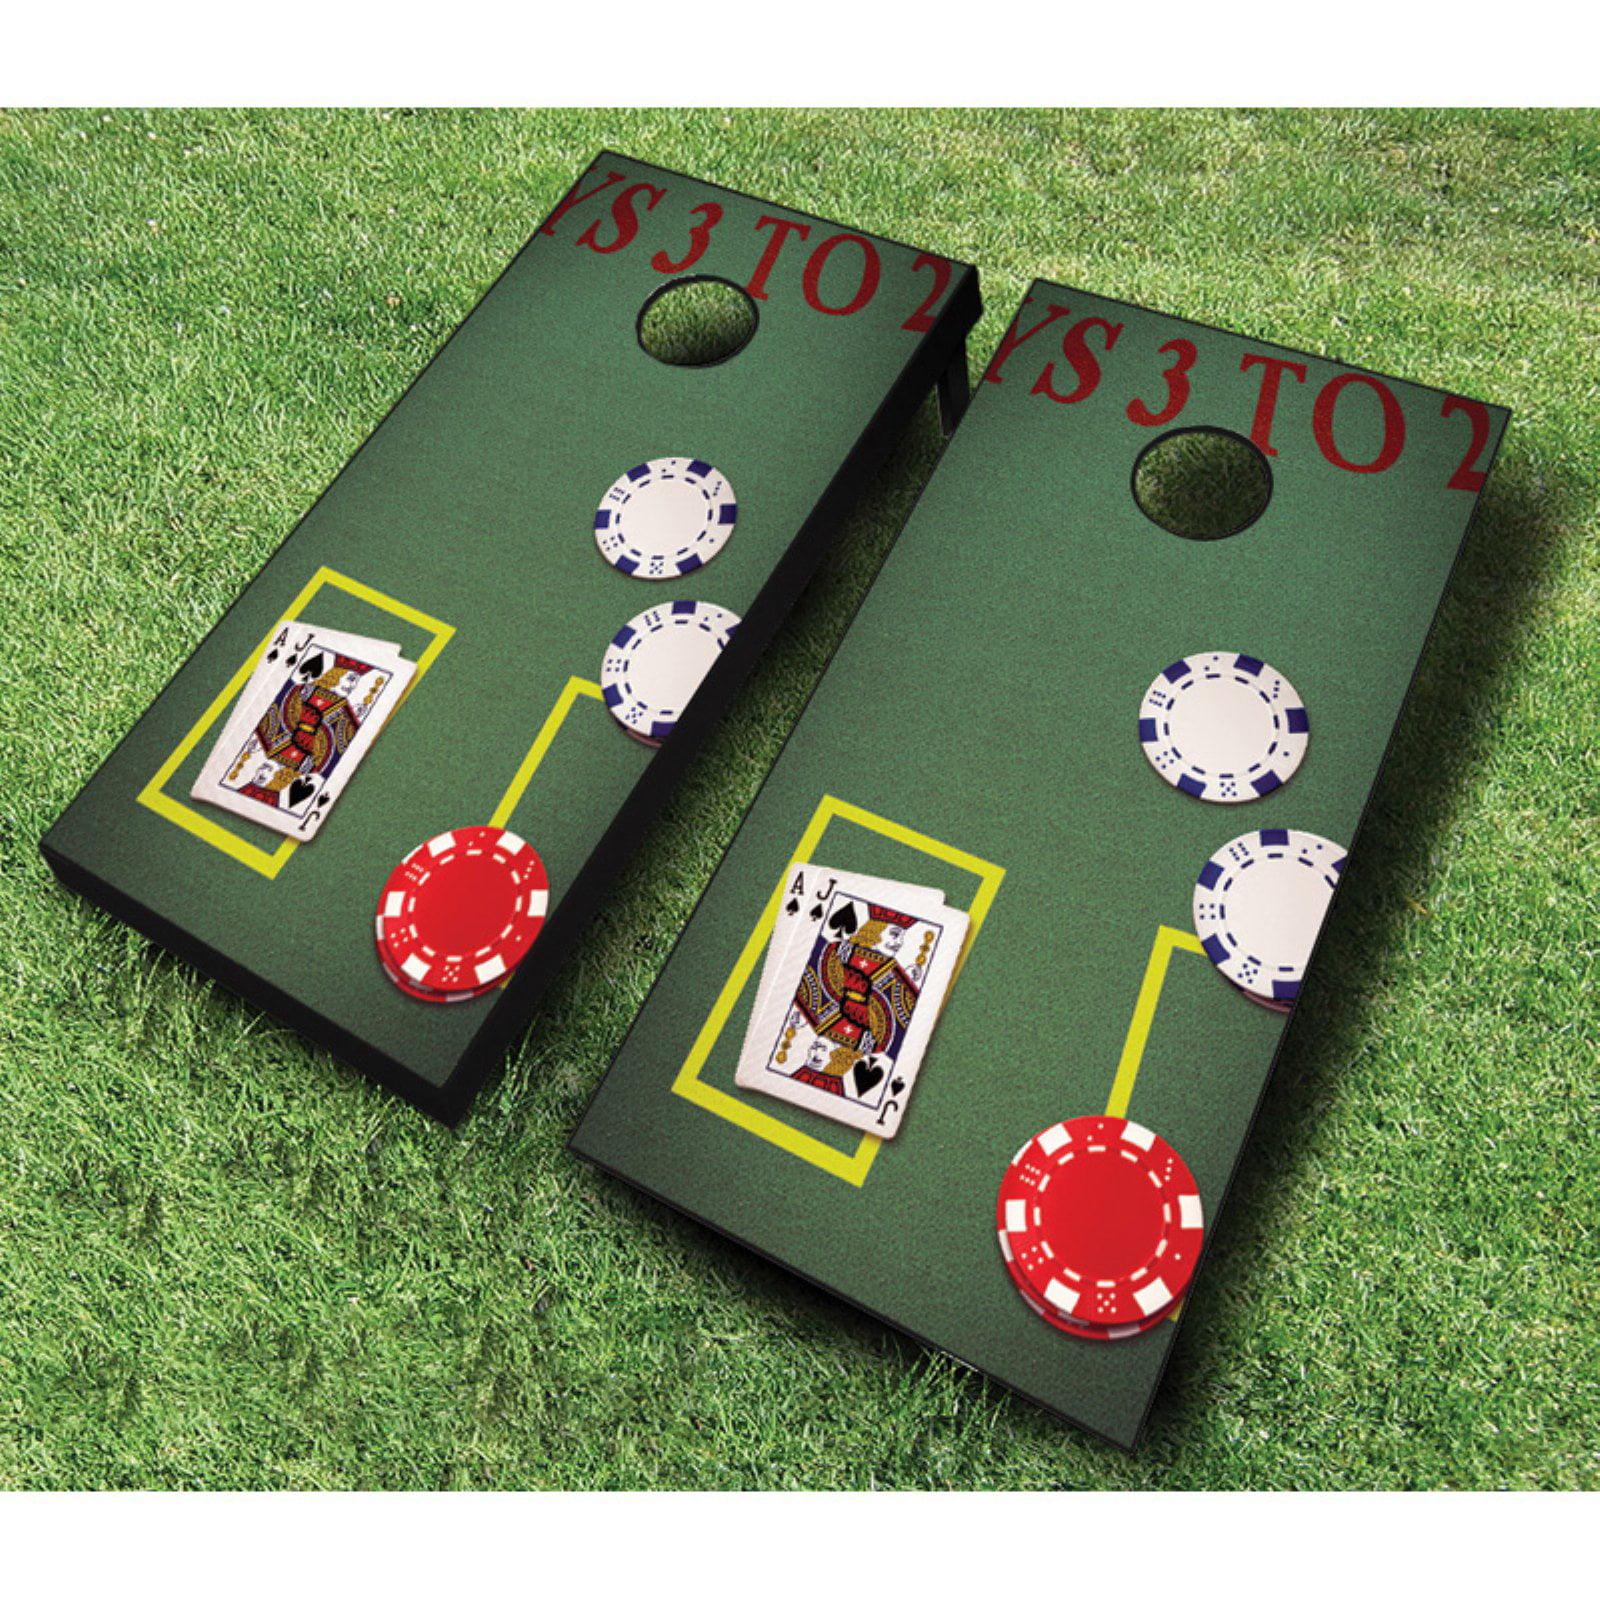 AJJ Cornhole Blackjack Cornhole Set with Bags by